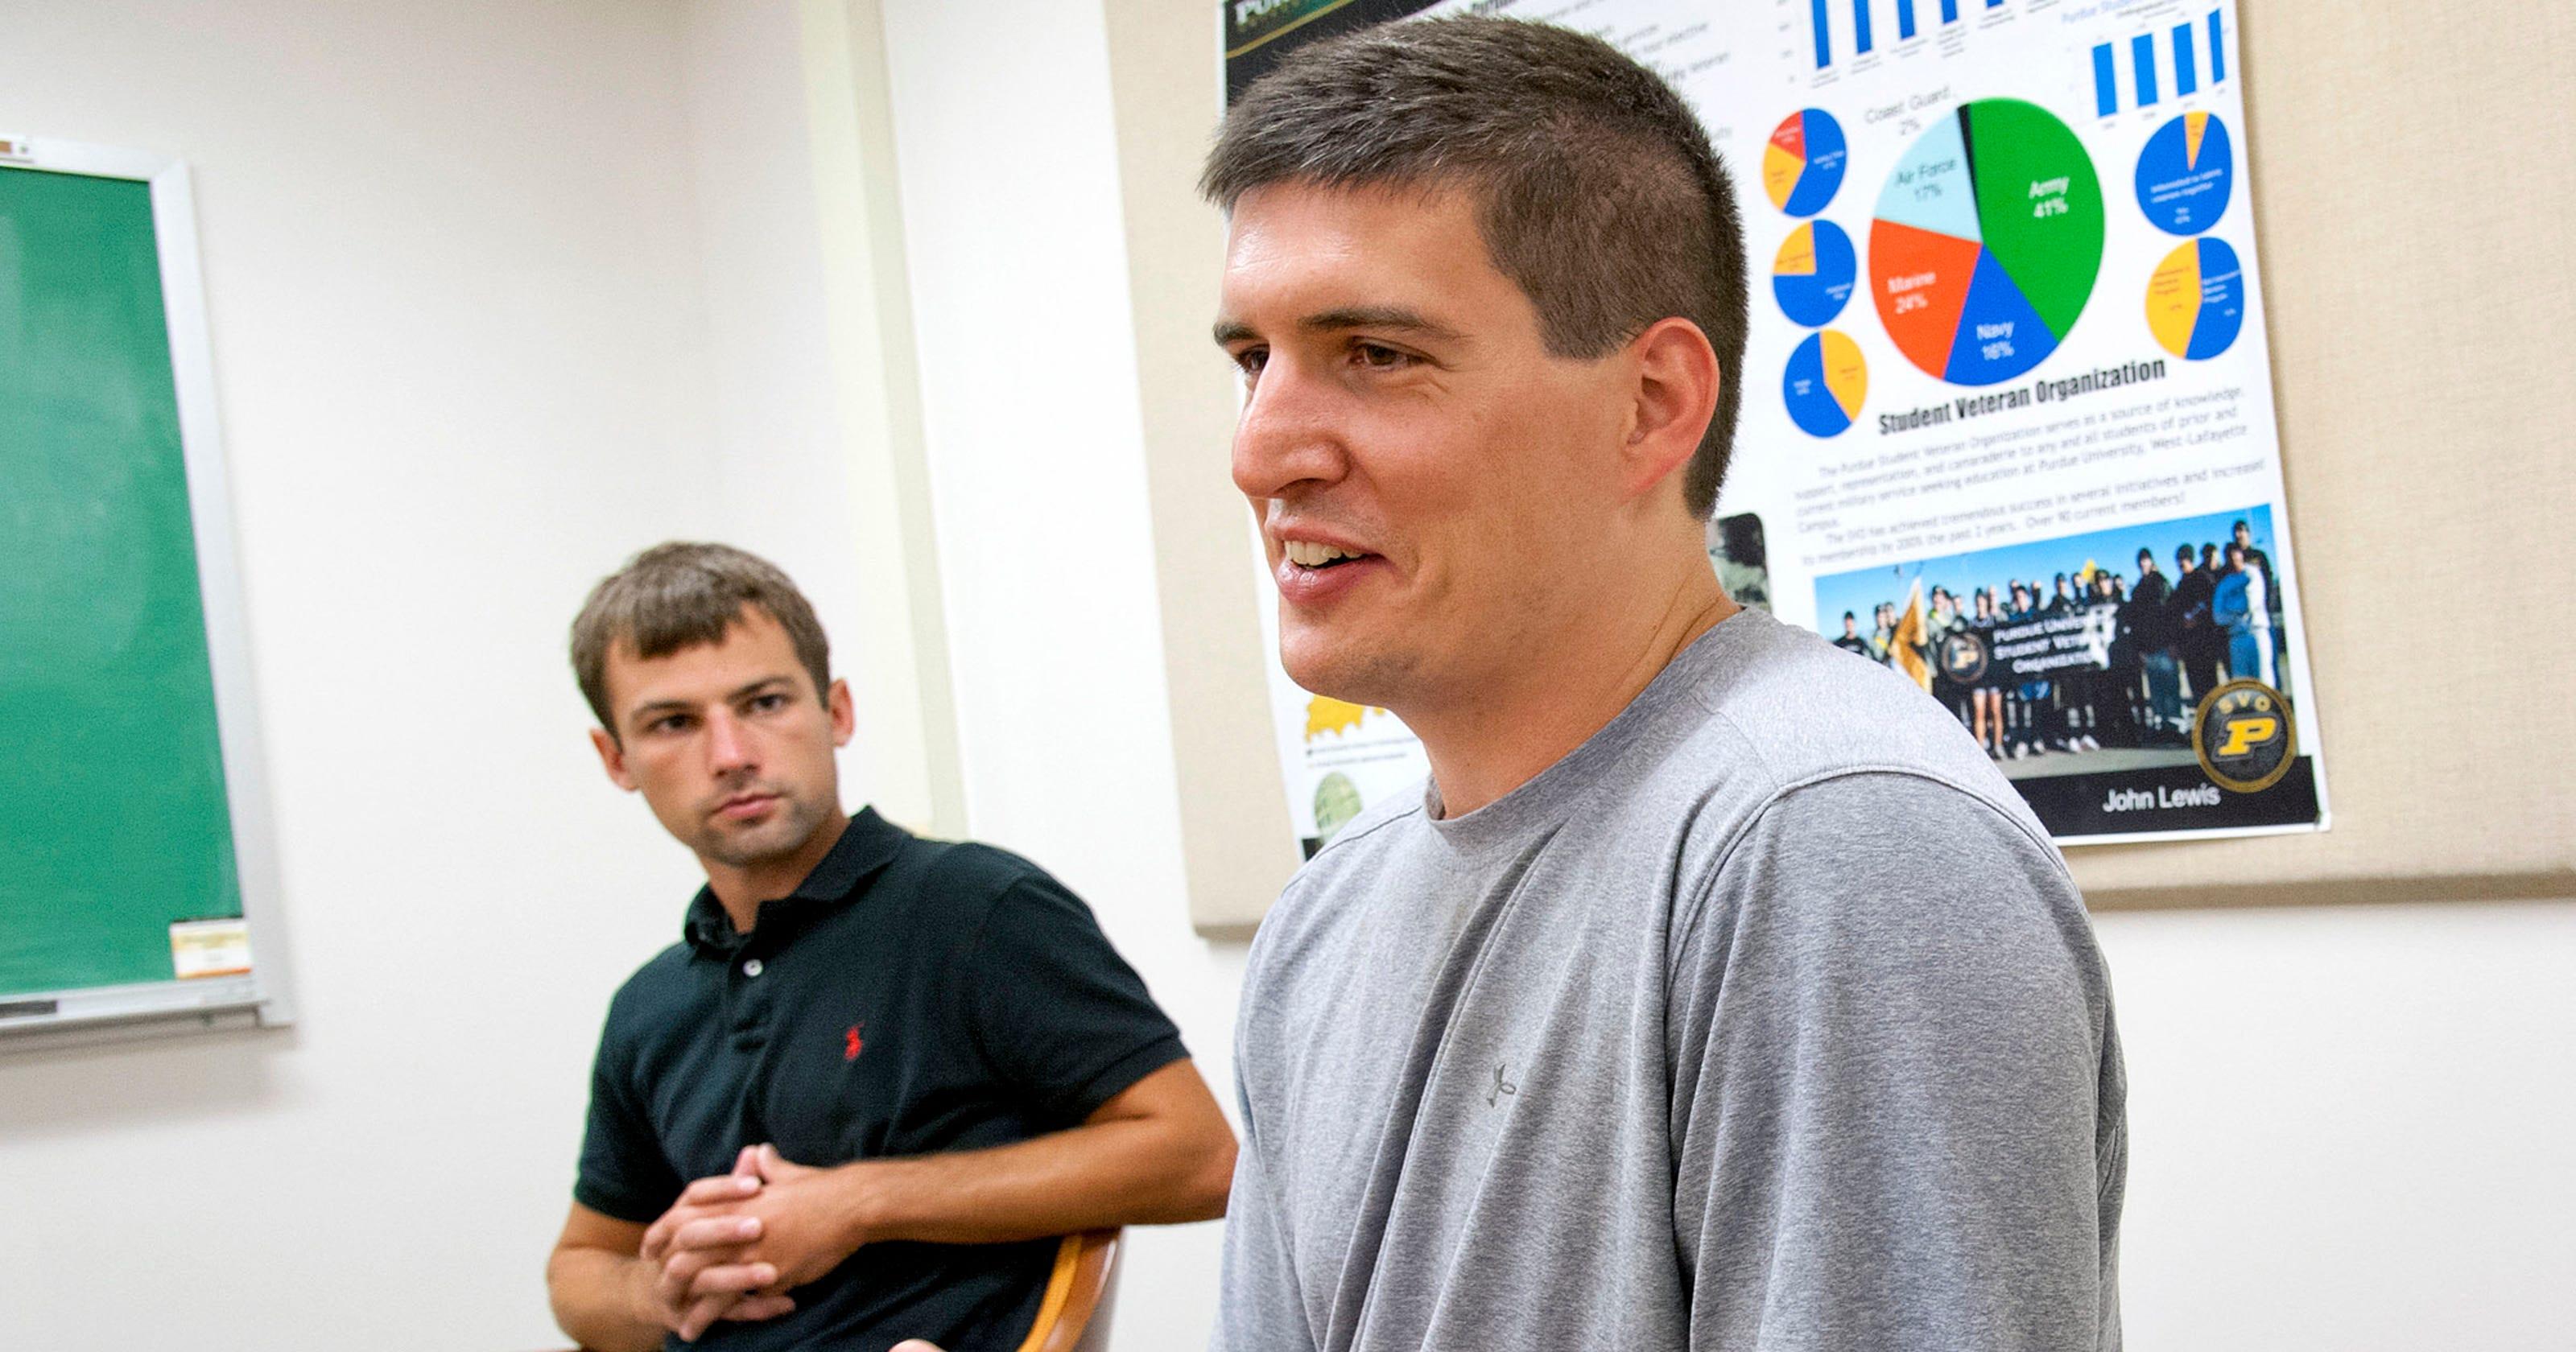 Translating military training into college credits